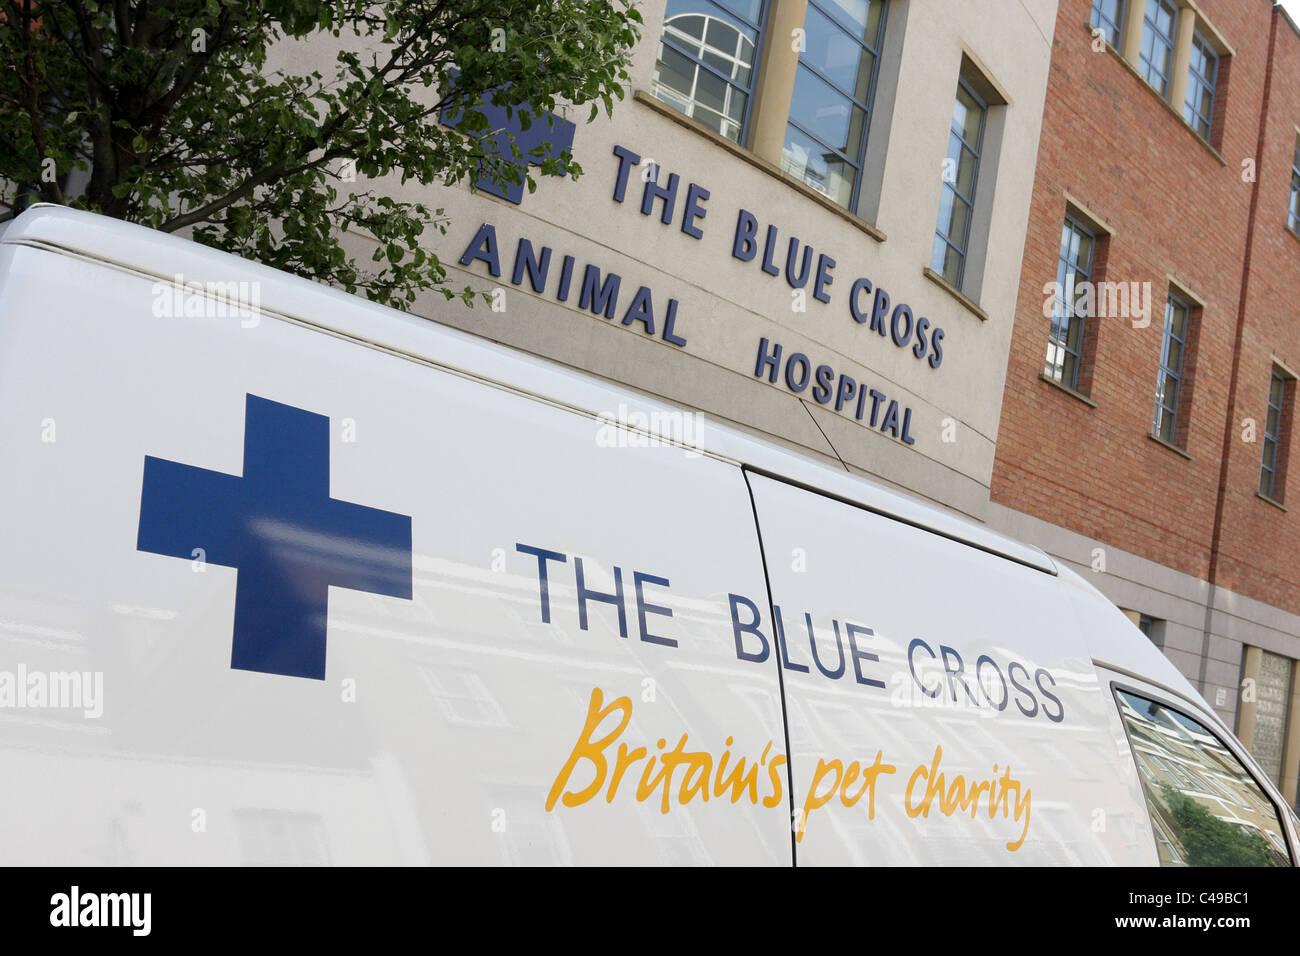 The Blue Cross Animal Hospital in Hugh Street, Victoria, London. - Stock Image